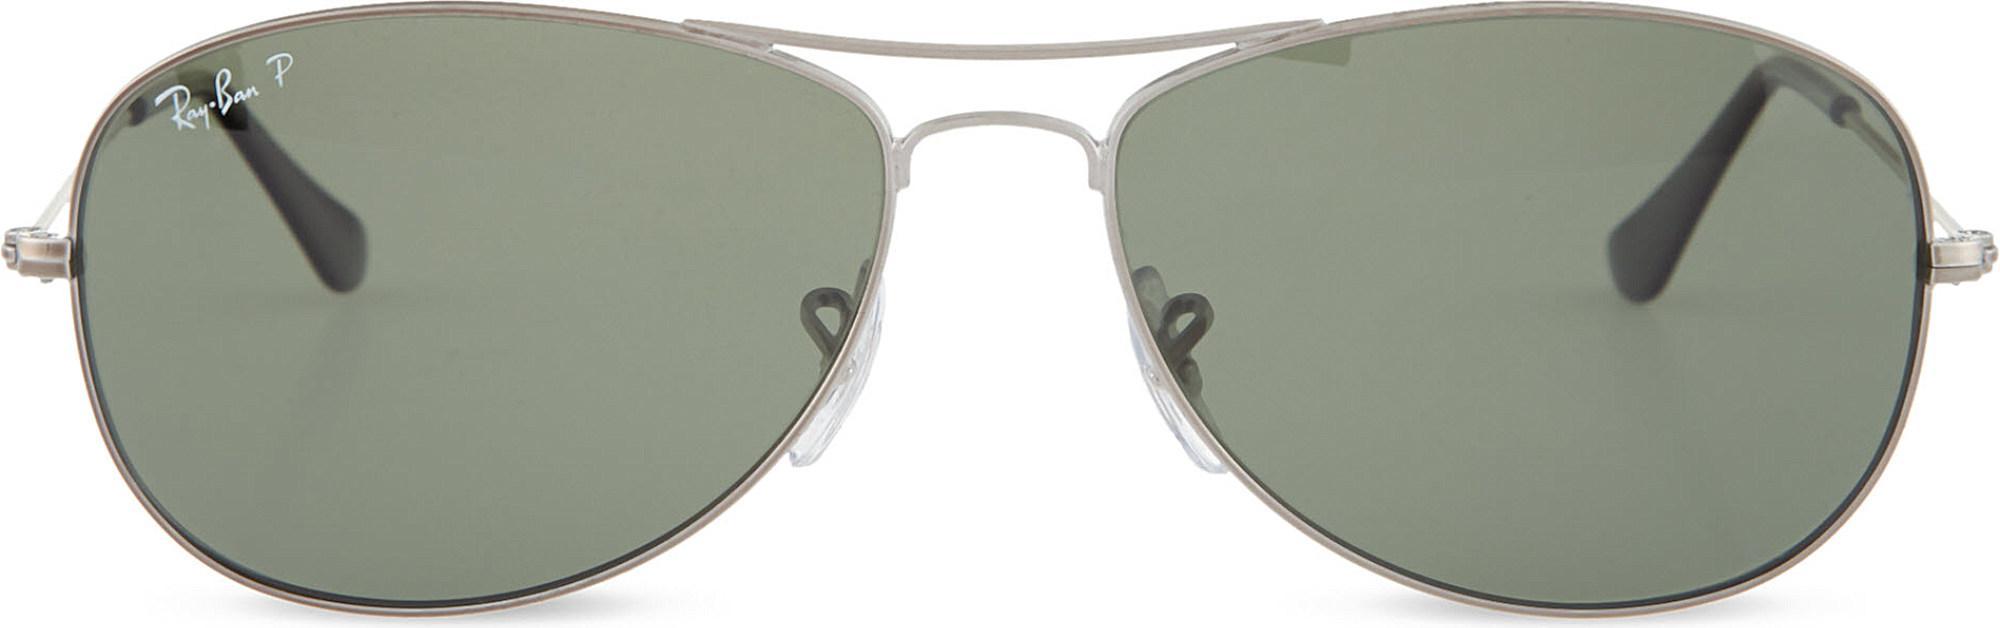 96d22511af Lyst - Ray-Ban Original Aviator Gunmetal-frame Sunglasses Rb3362 59 ...